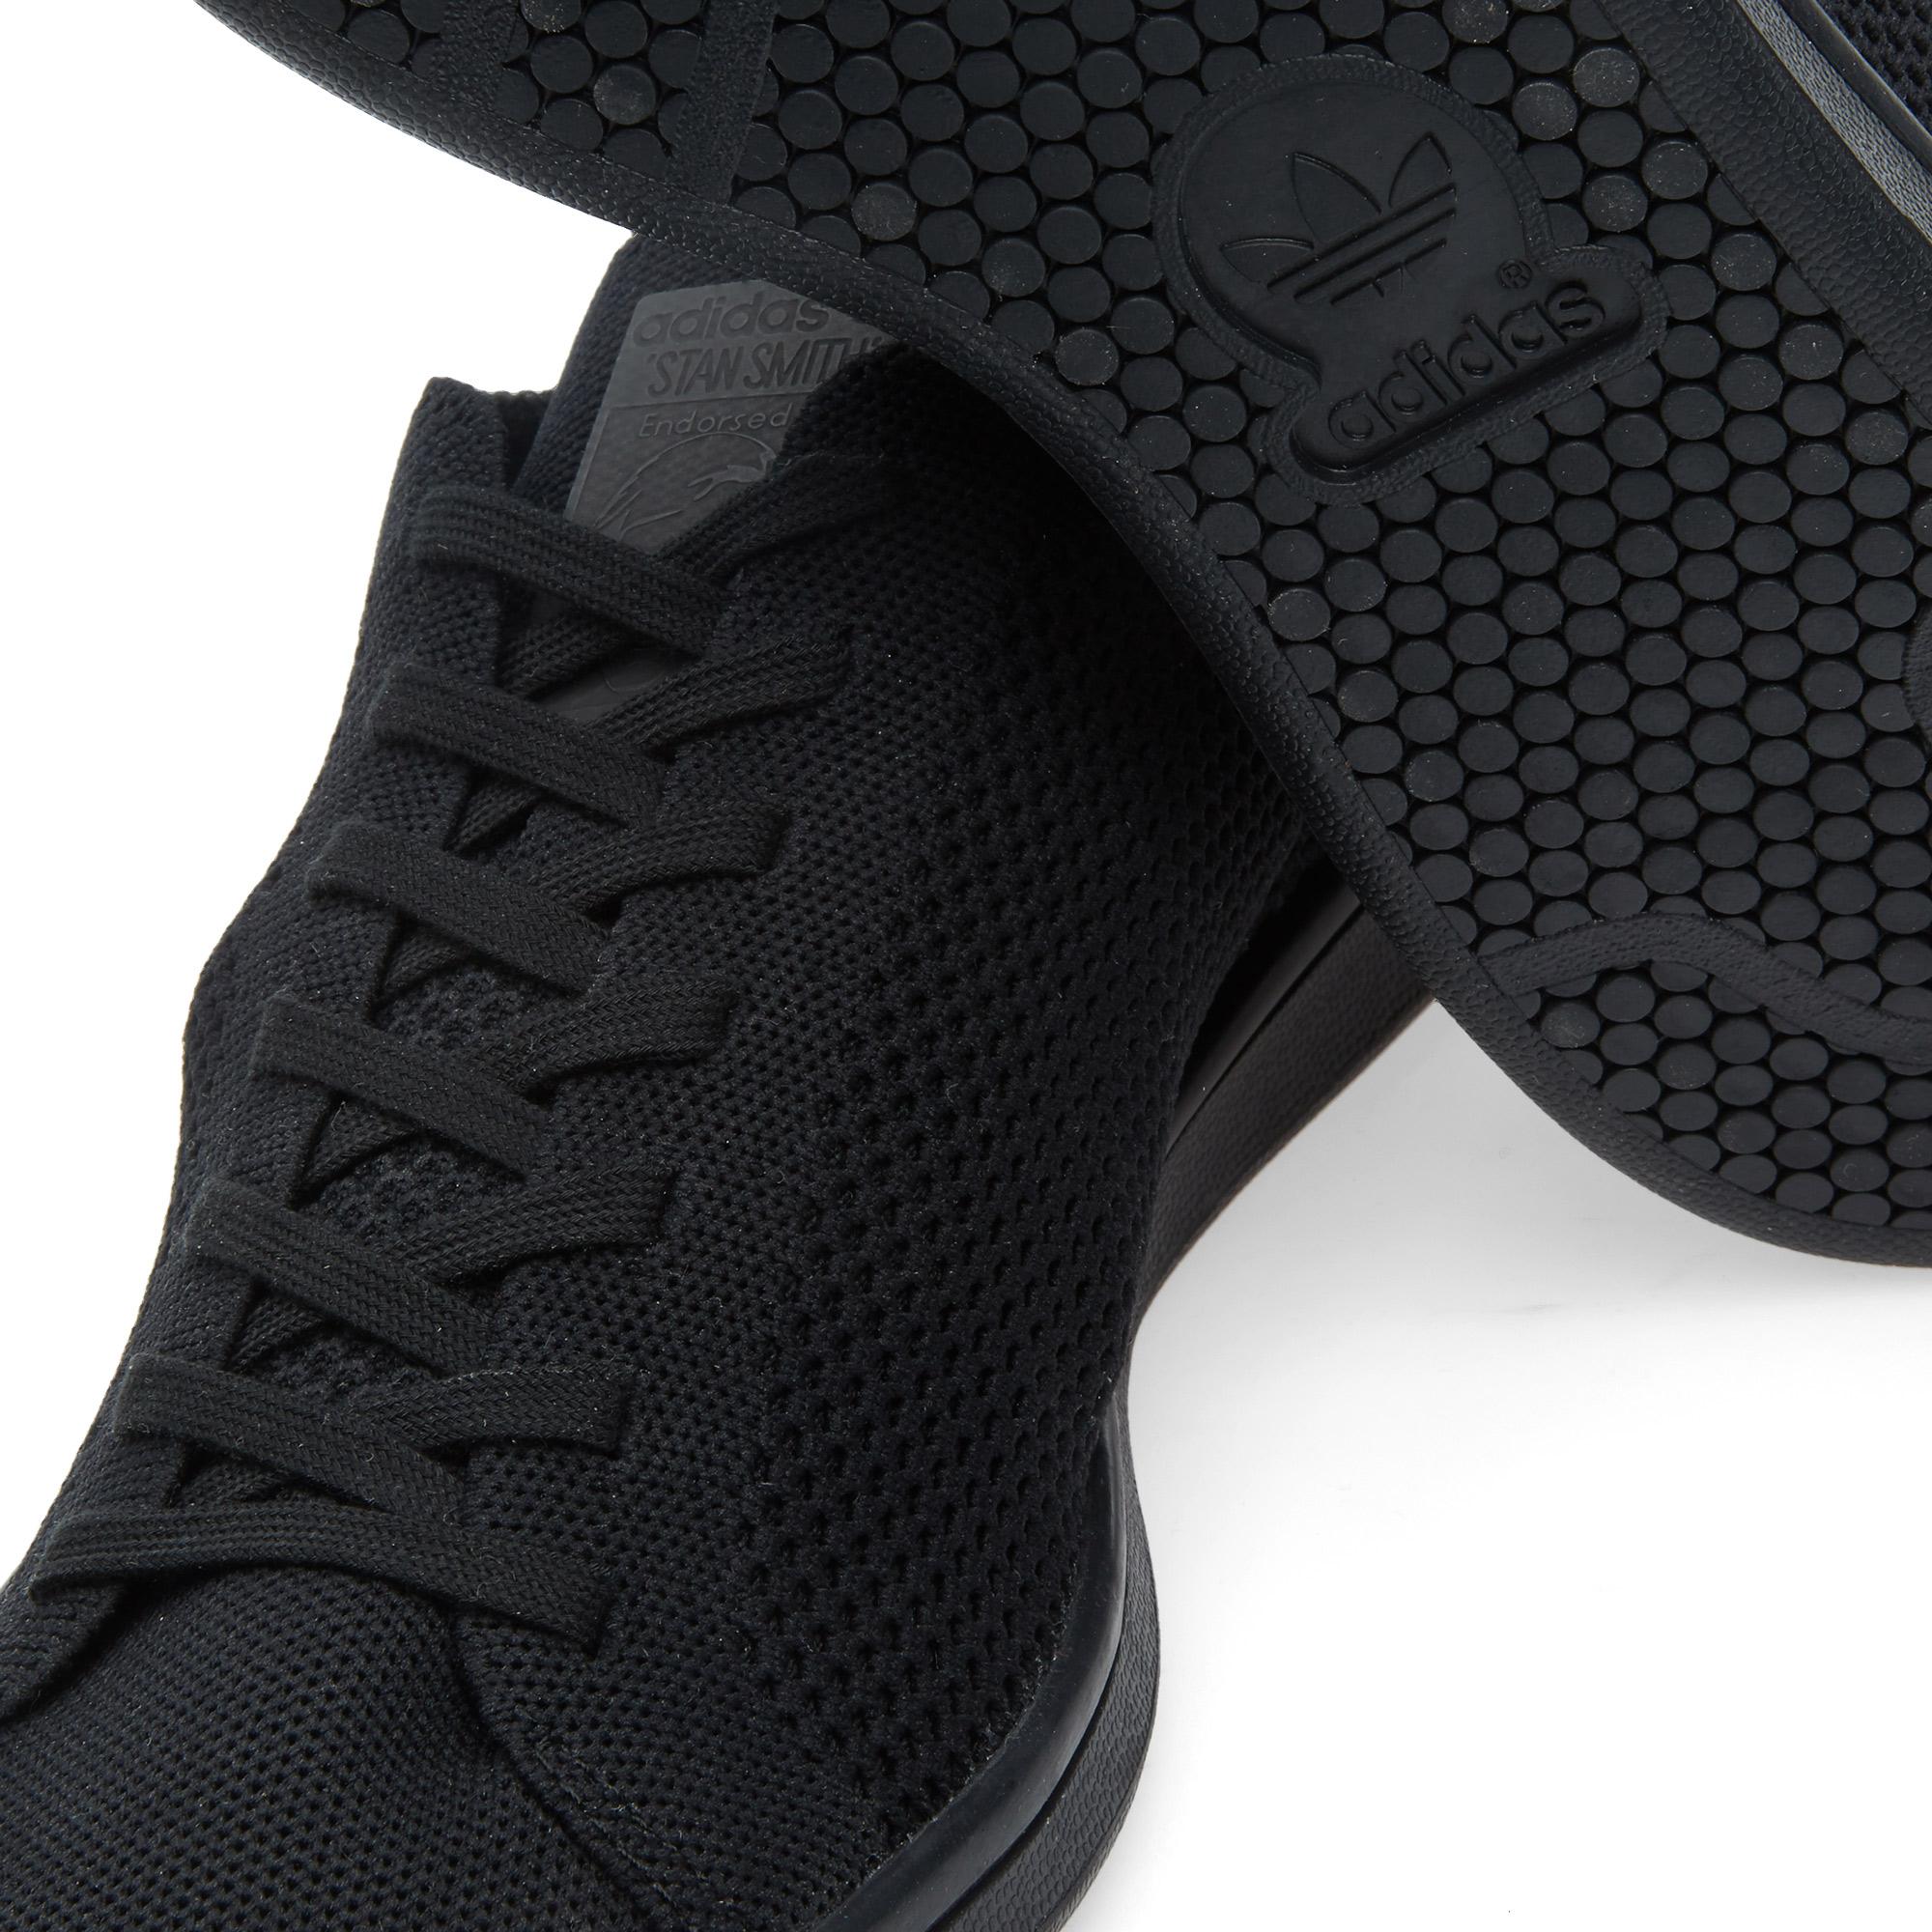 Adidas Stan Smith Knit Black